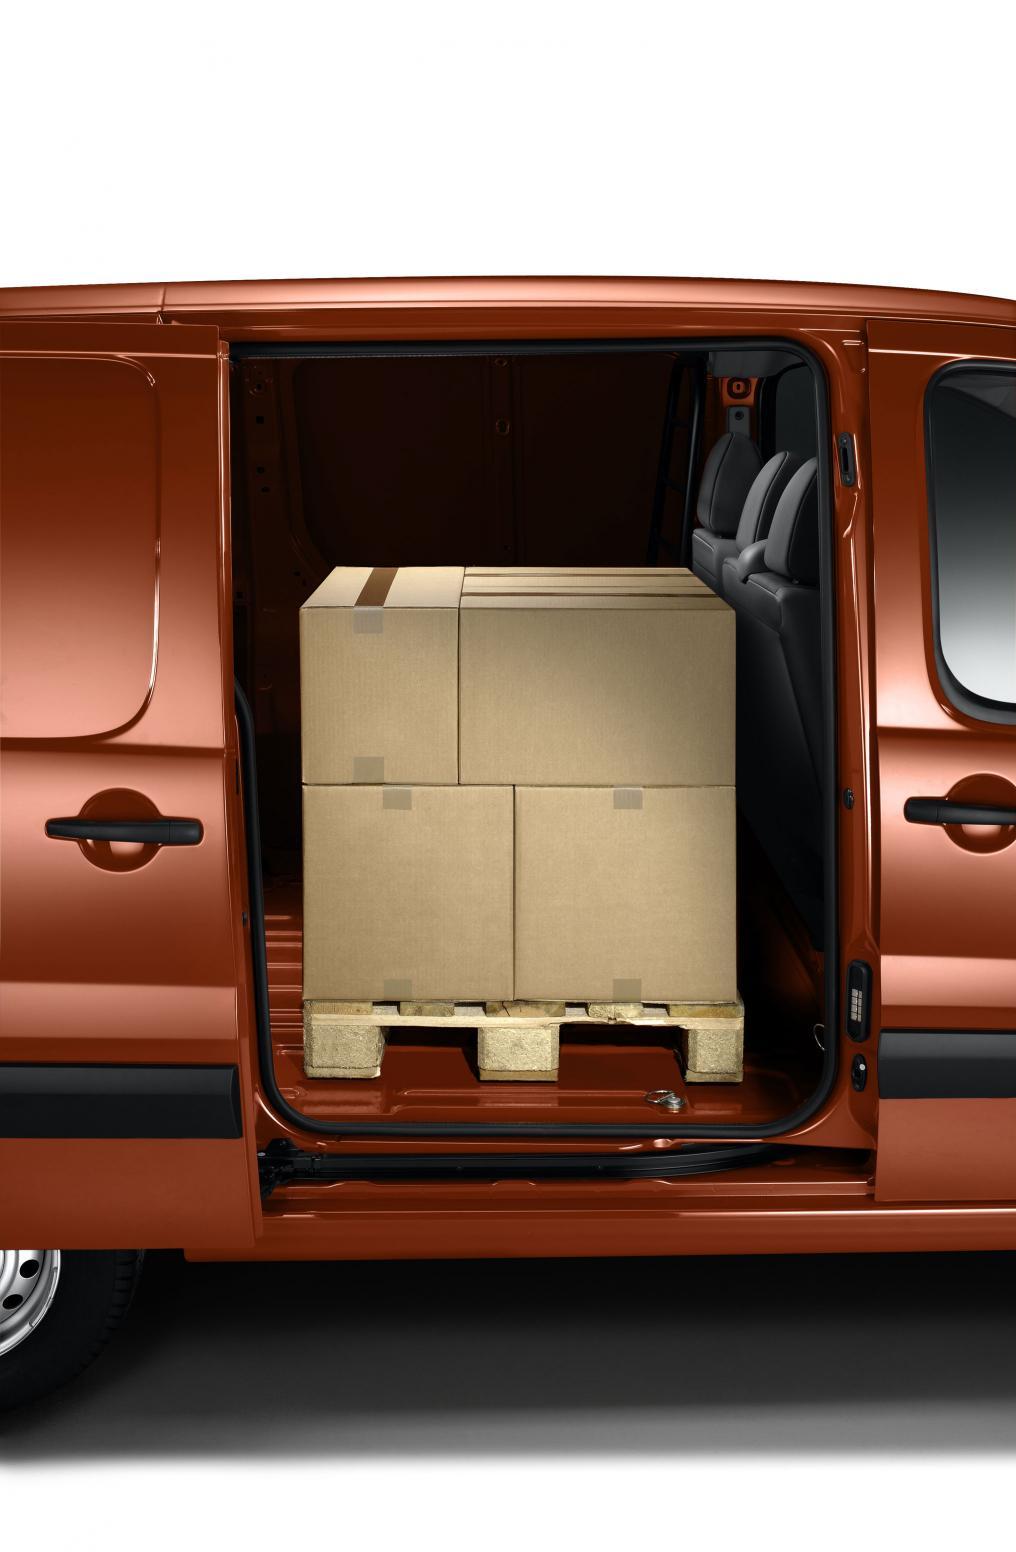 louer voiture utilitaire location auto clermont. Black Bedroom Furniture Sets. Home Design Ideas